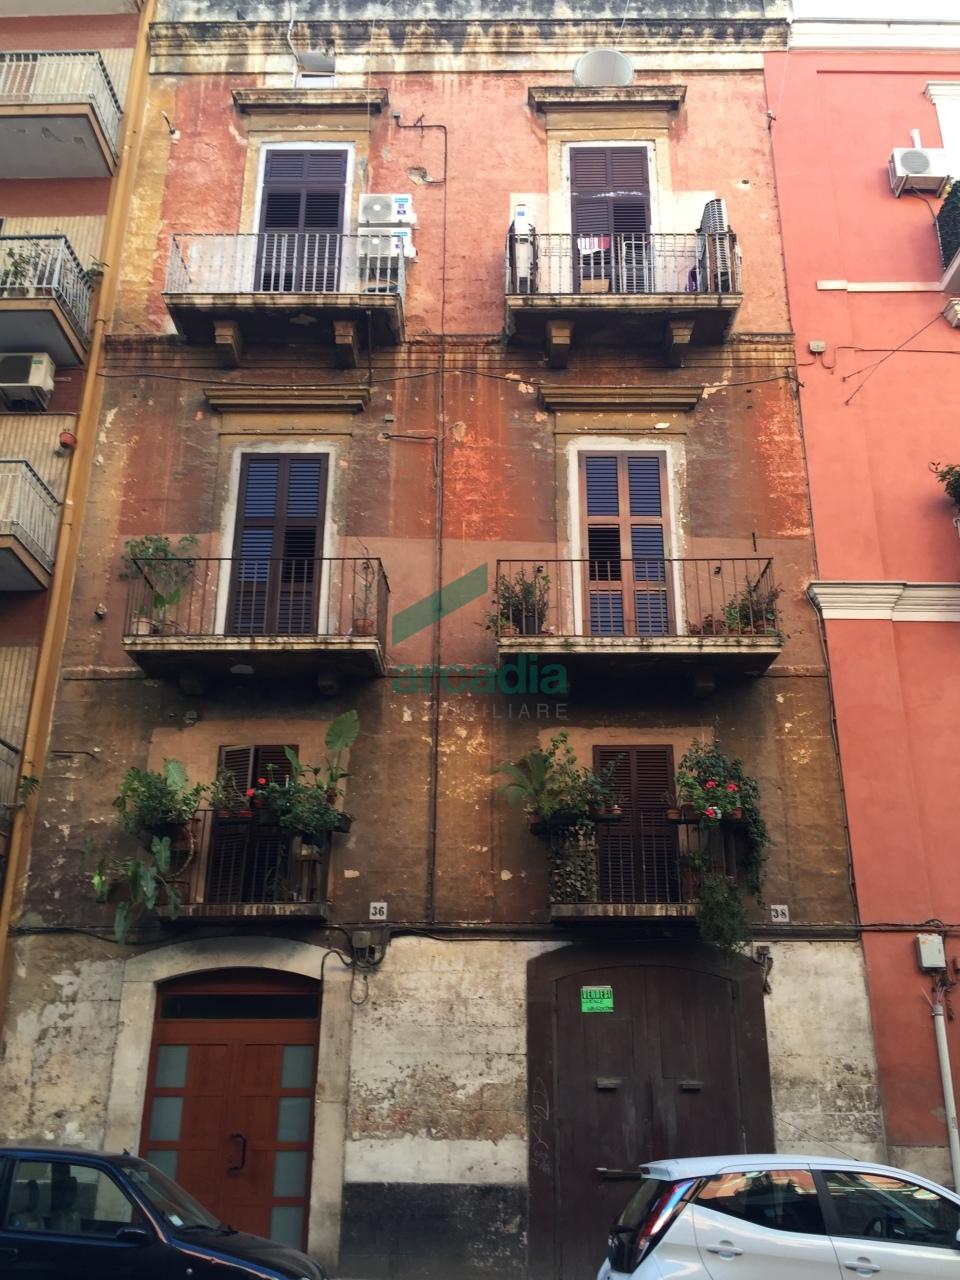 Bilocale Bari Via Bonazzi 36 2